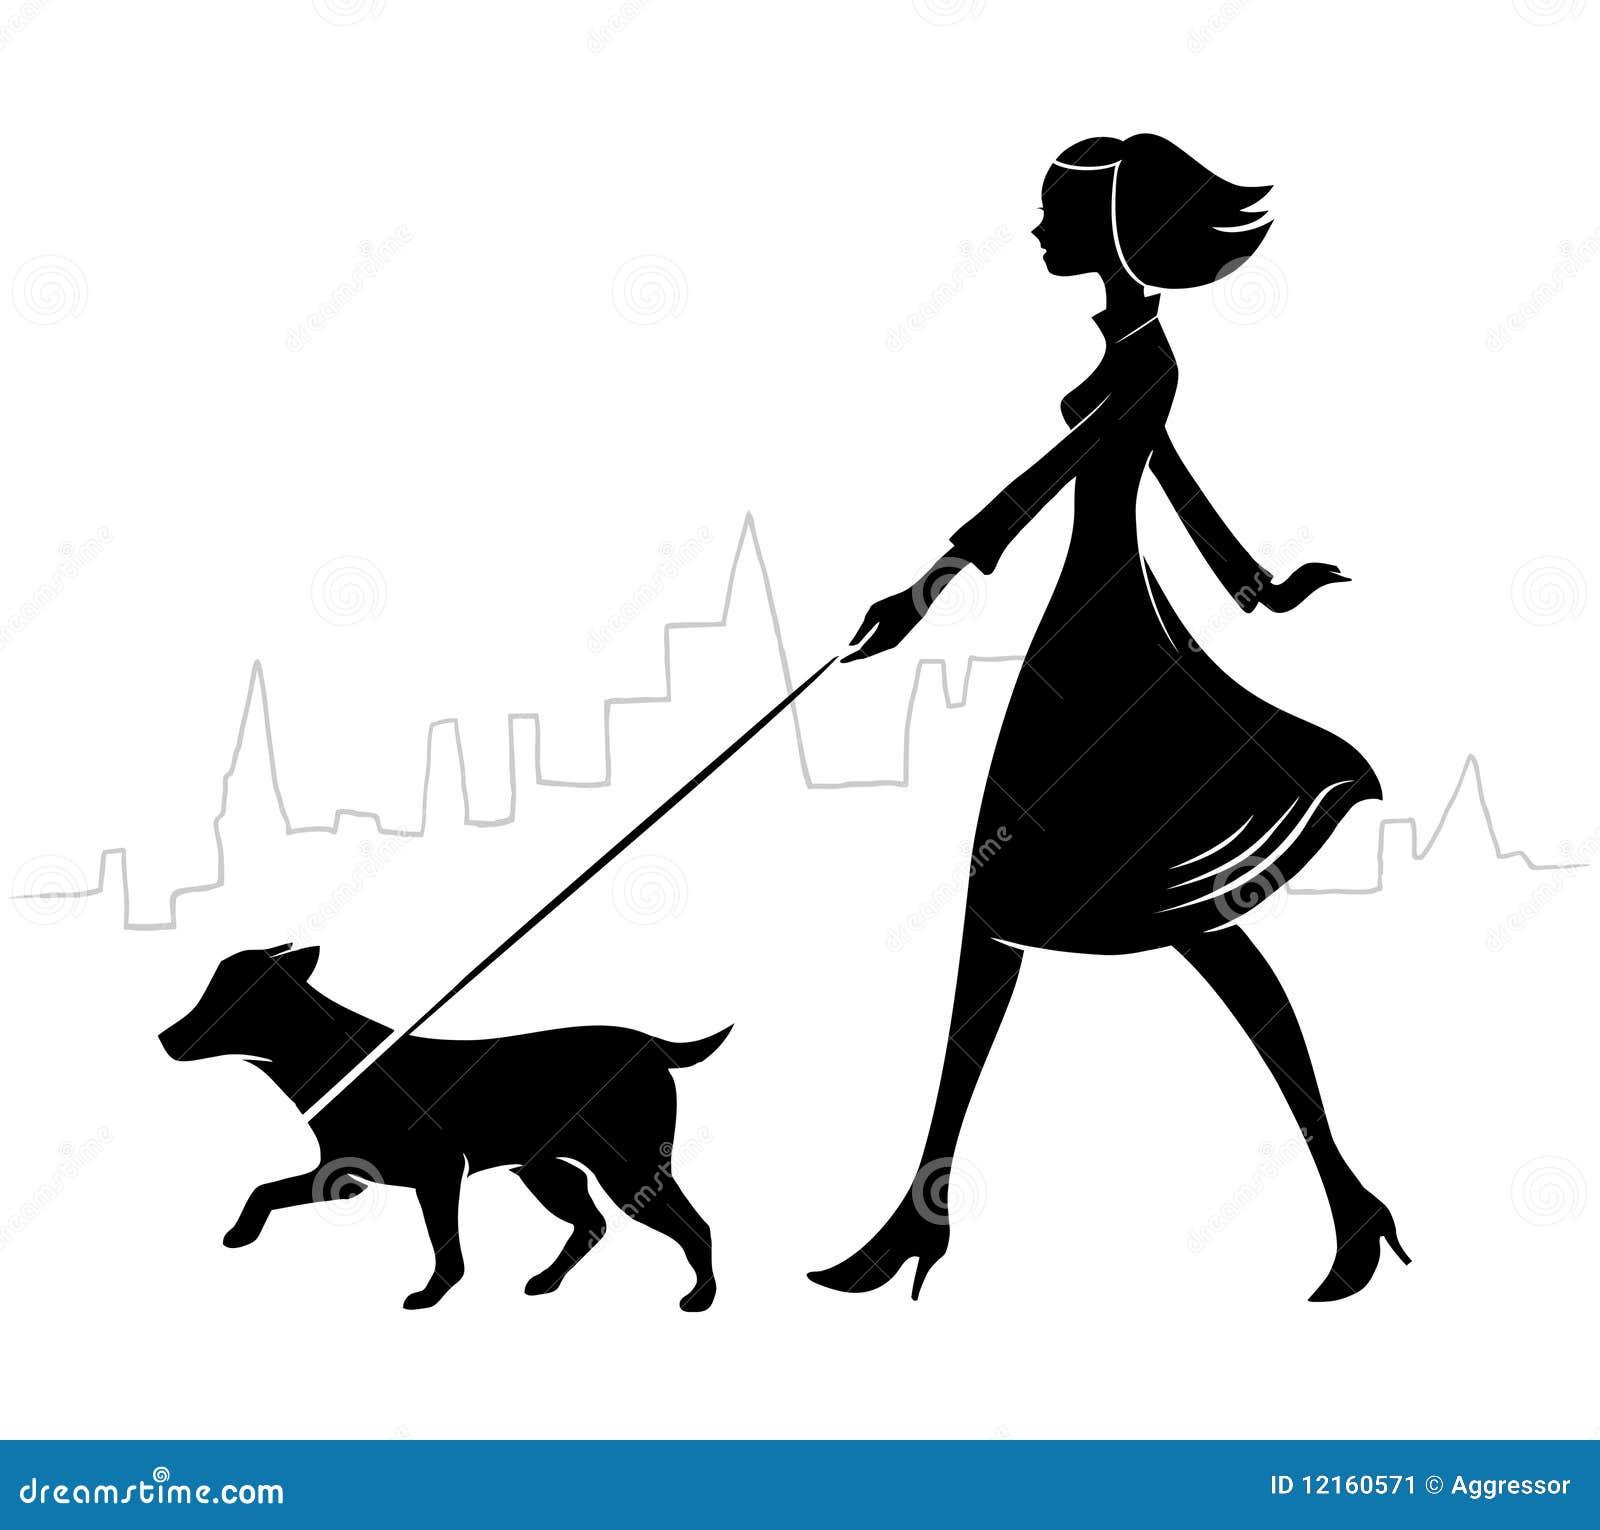 clipart girl walking dog - photo #24